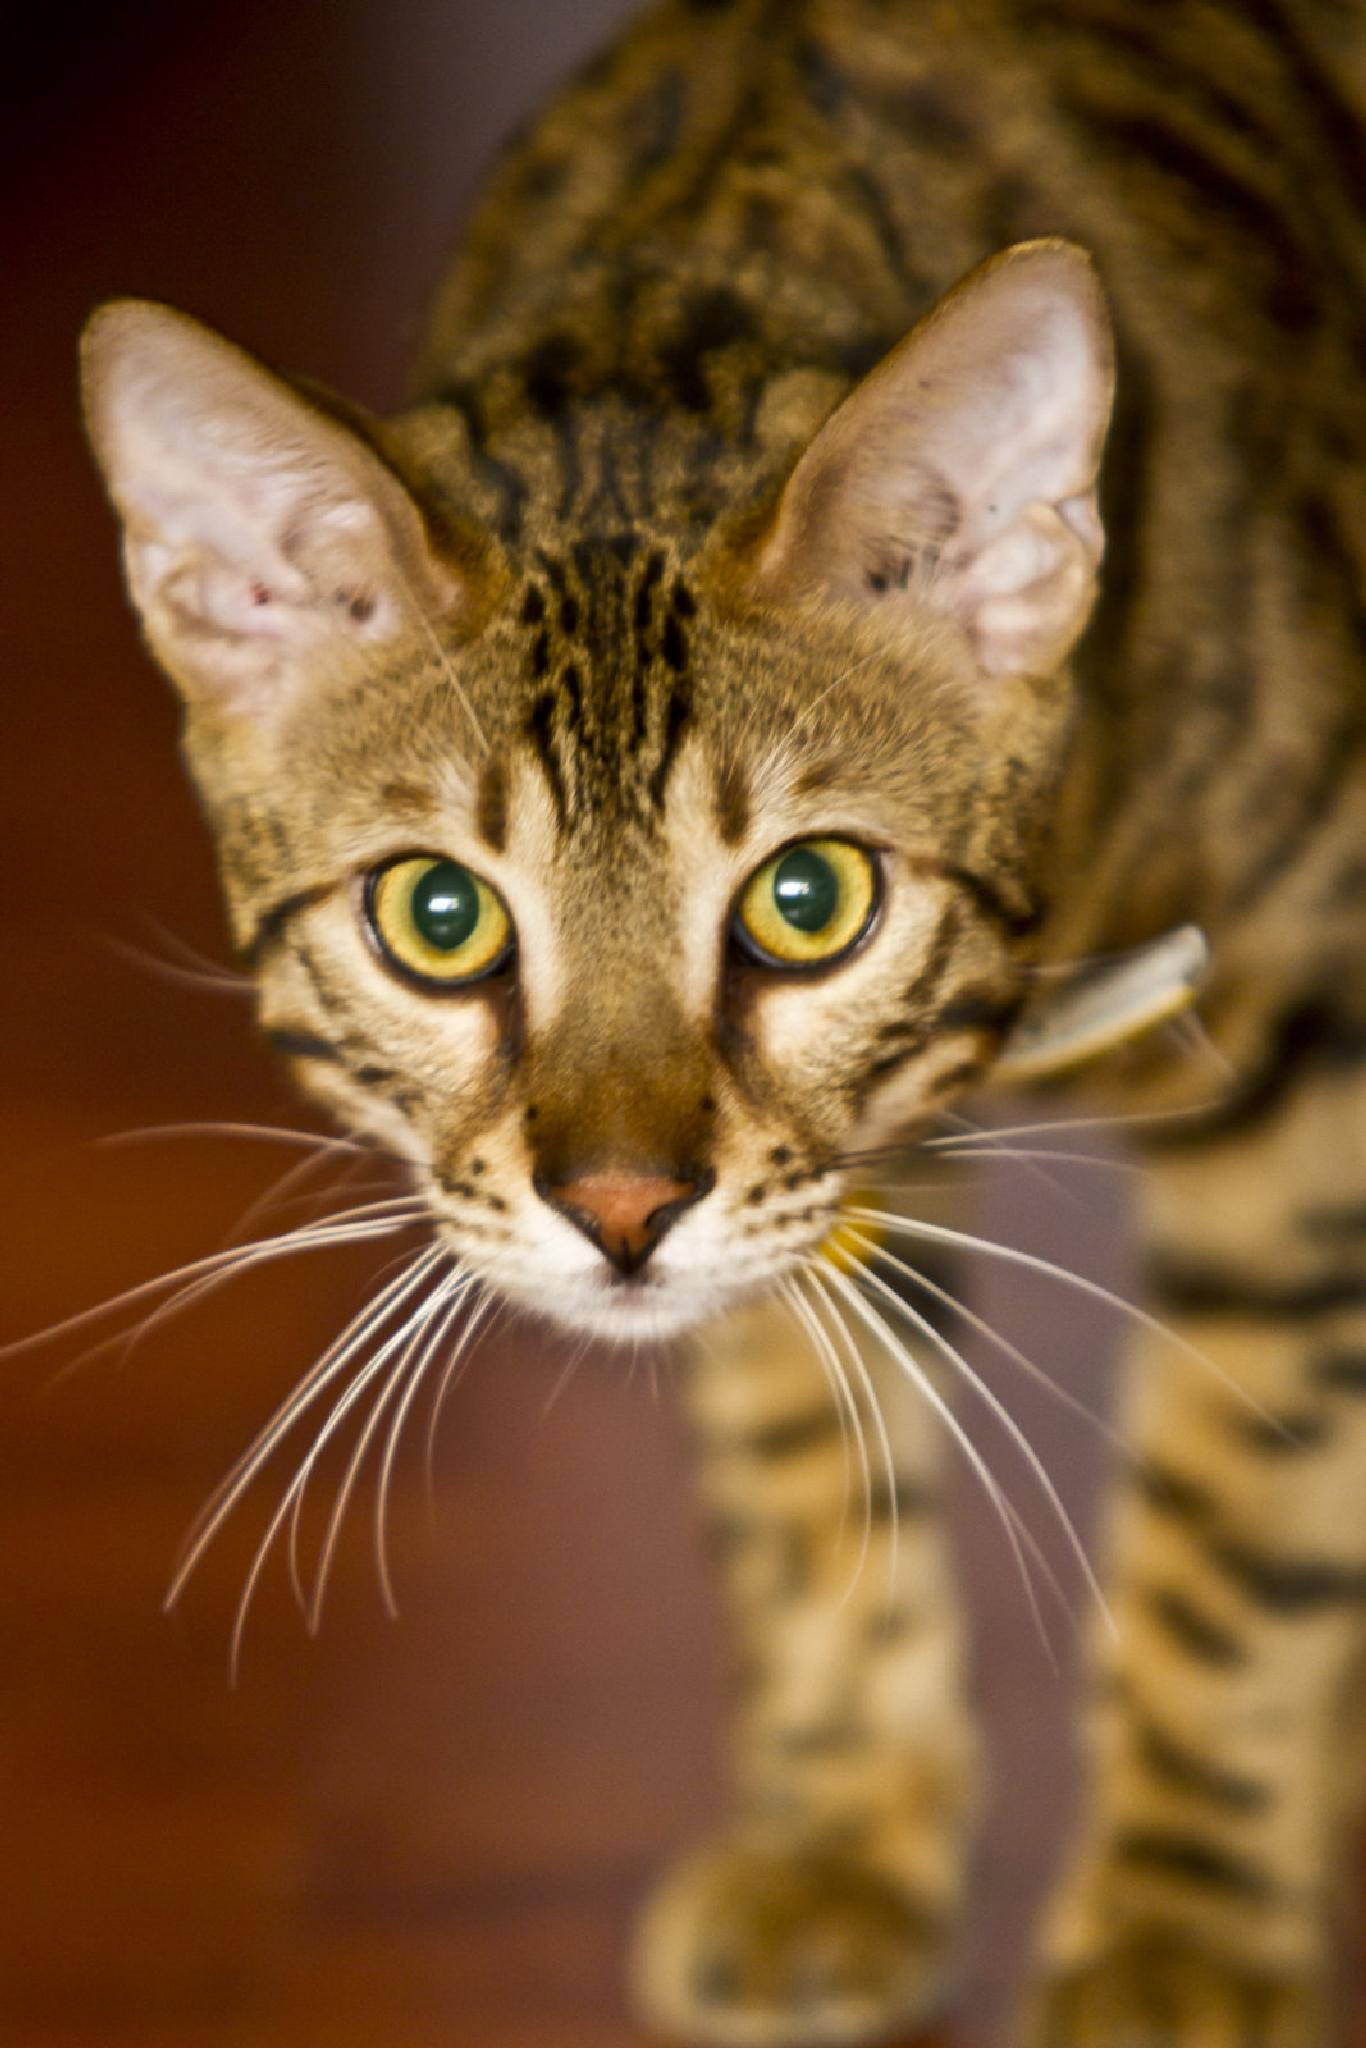 Tiger Cat by JOSE O. CABALLERO HERNANDEZ